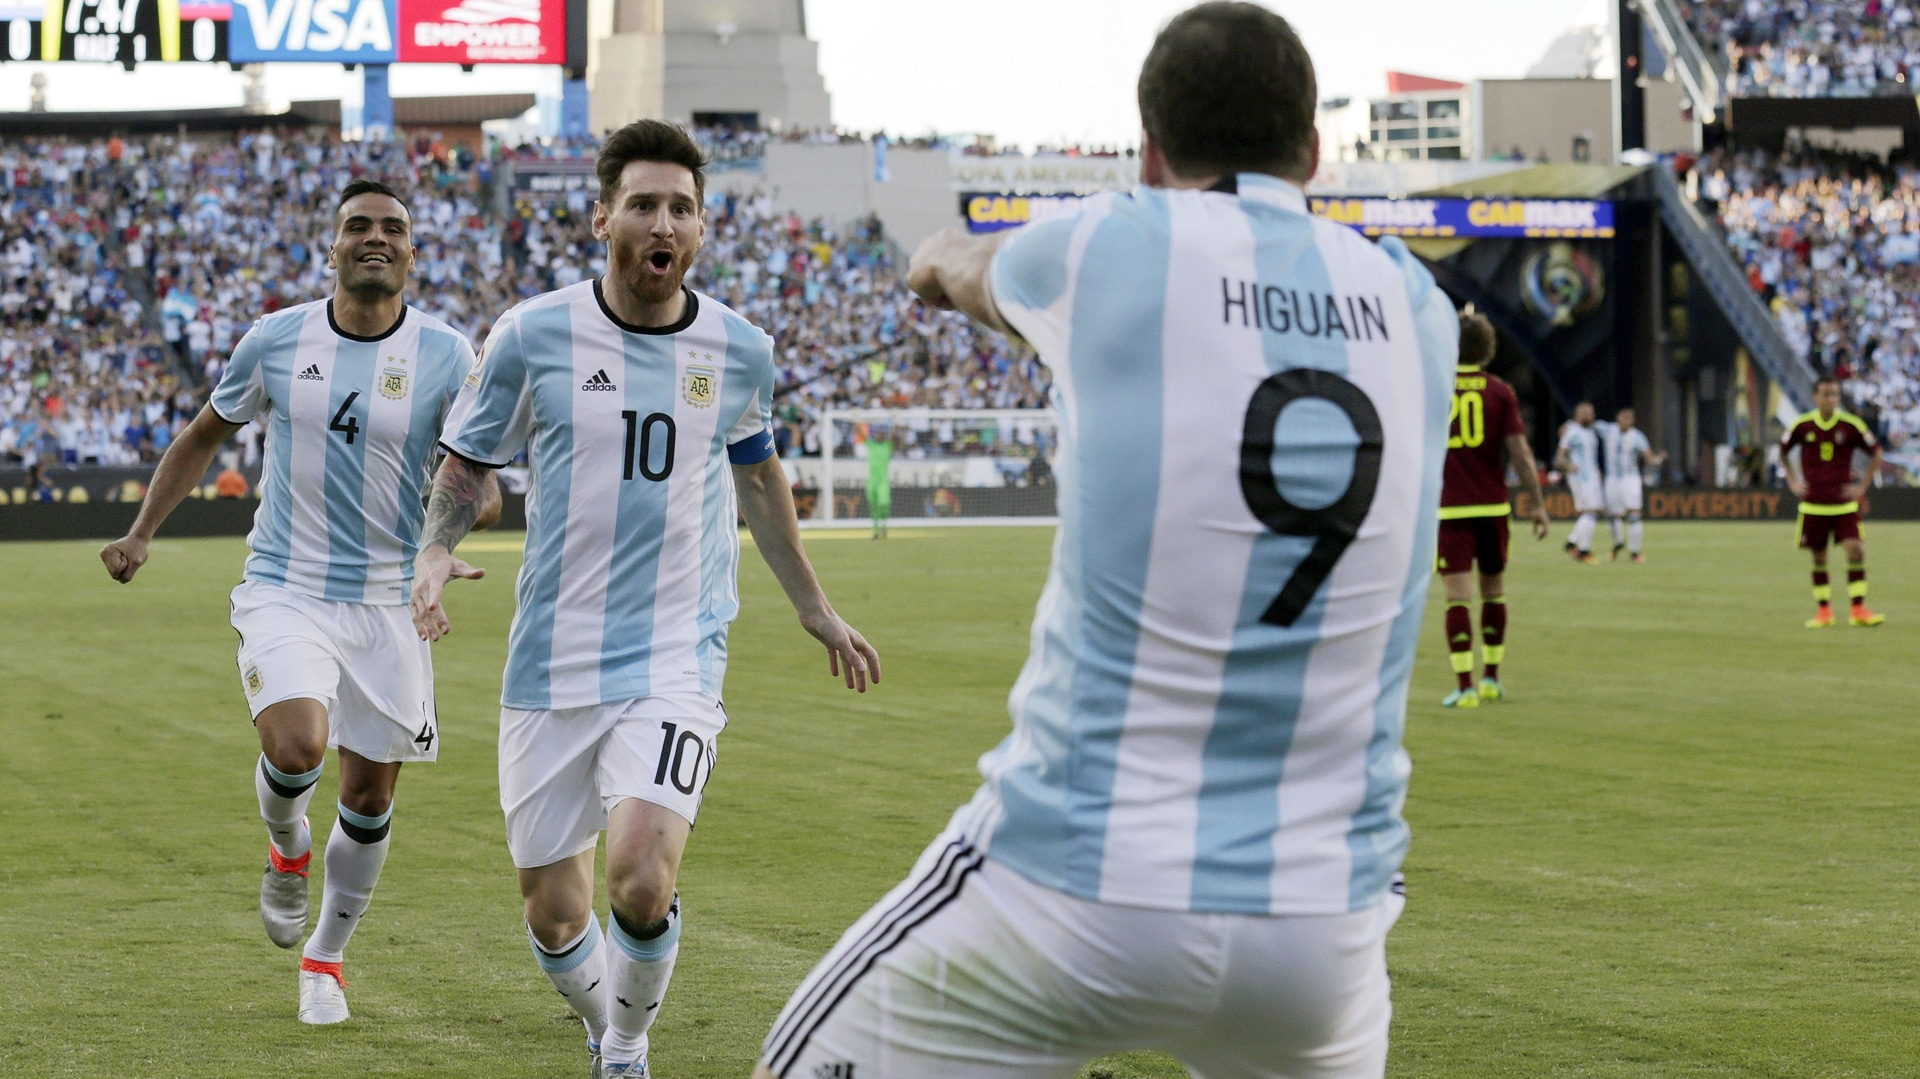 nazionale argentina arechi salerno